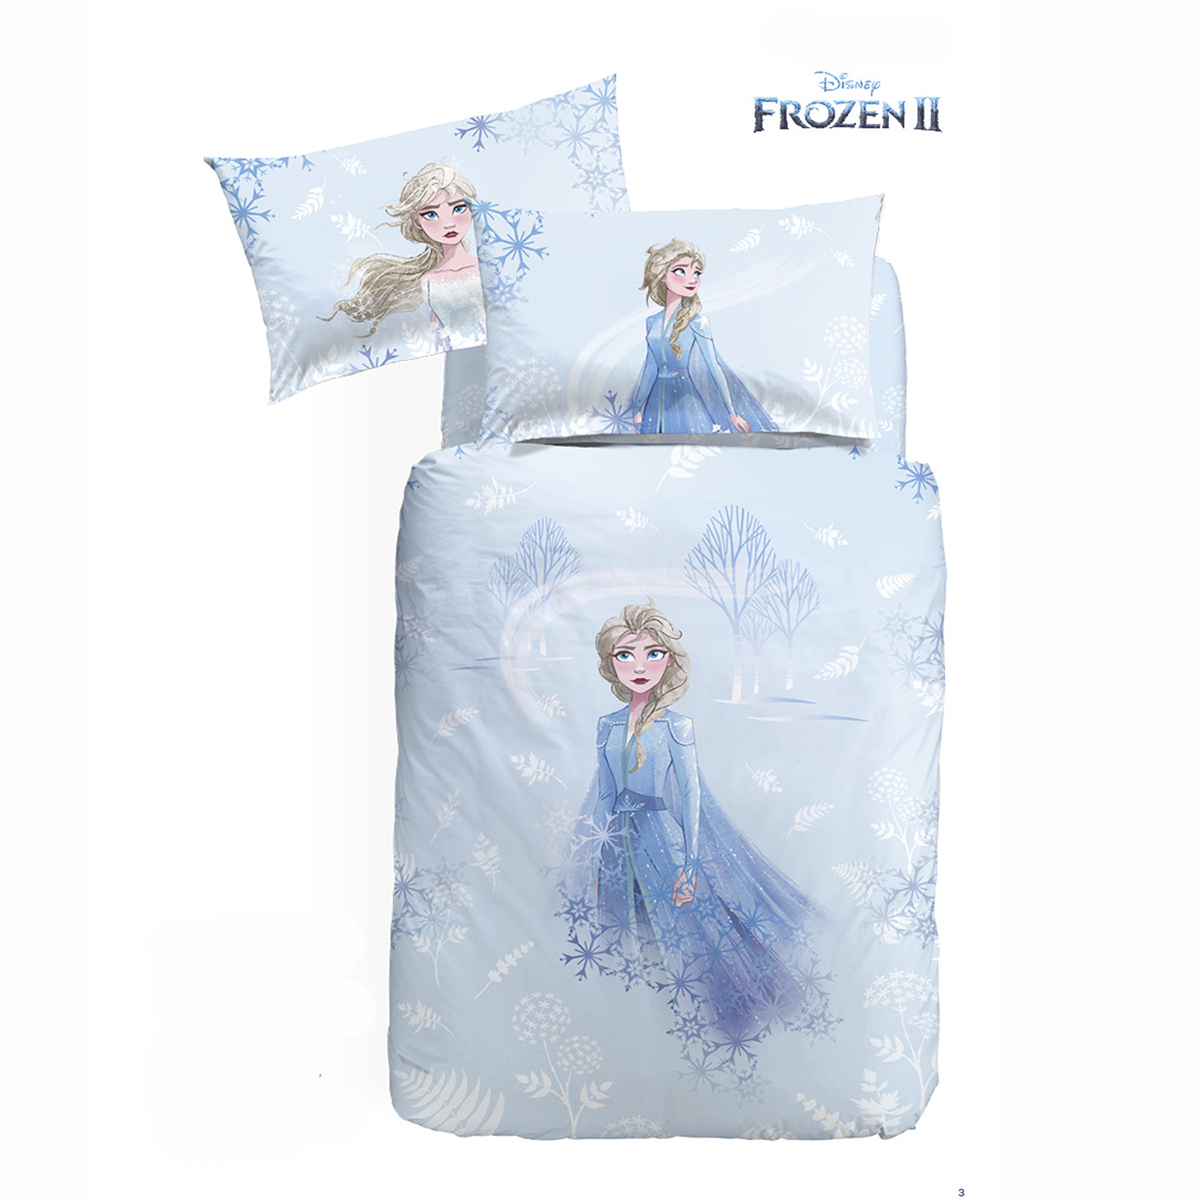 Copripiumino Frozen Cotone.Set Copripiumino Frozen Jn23d0e9 Jnktodaynews Com